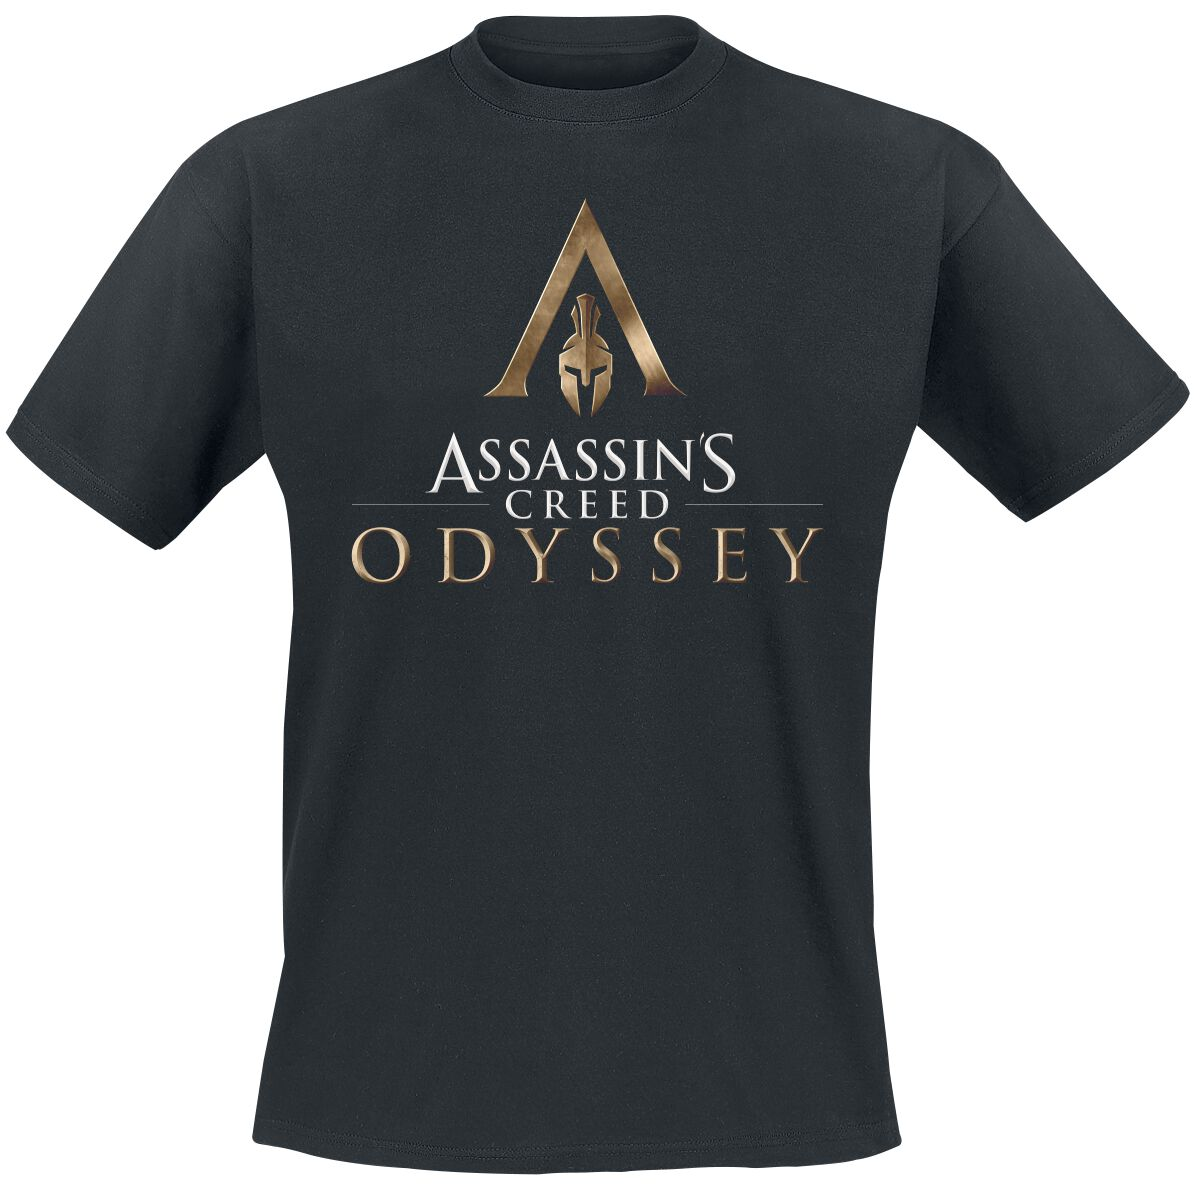 Image of   Assassin's Creed Odyssey - Logo T-Shirt sort